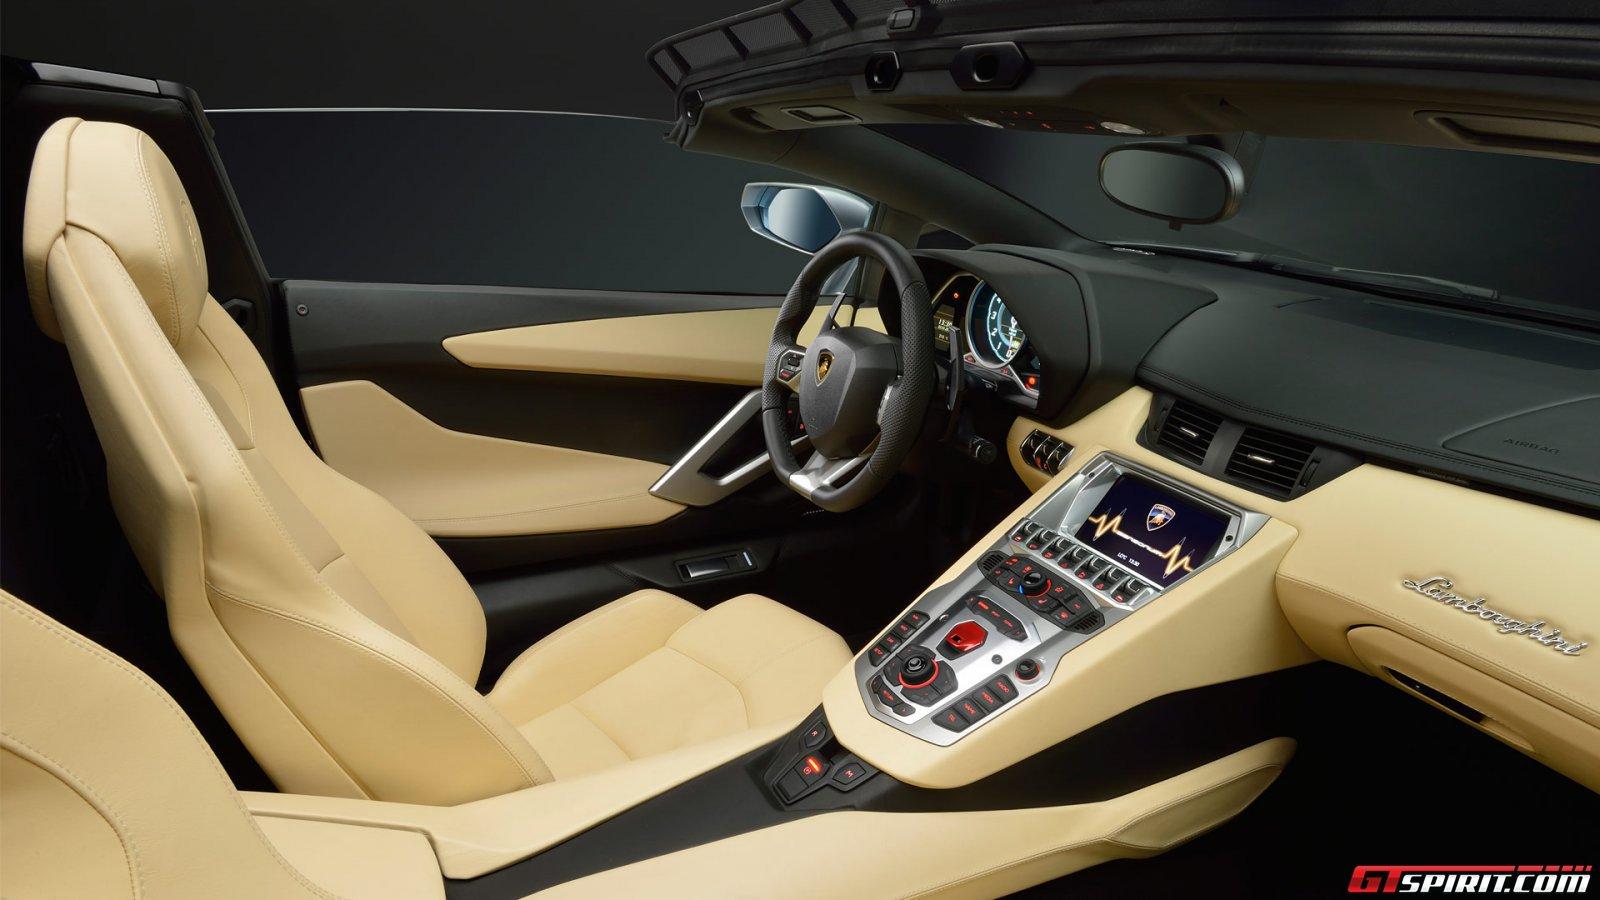 2013 Lamborghini Aventador LP700-4 Roadster Photo 9